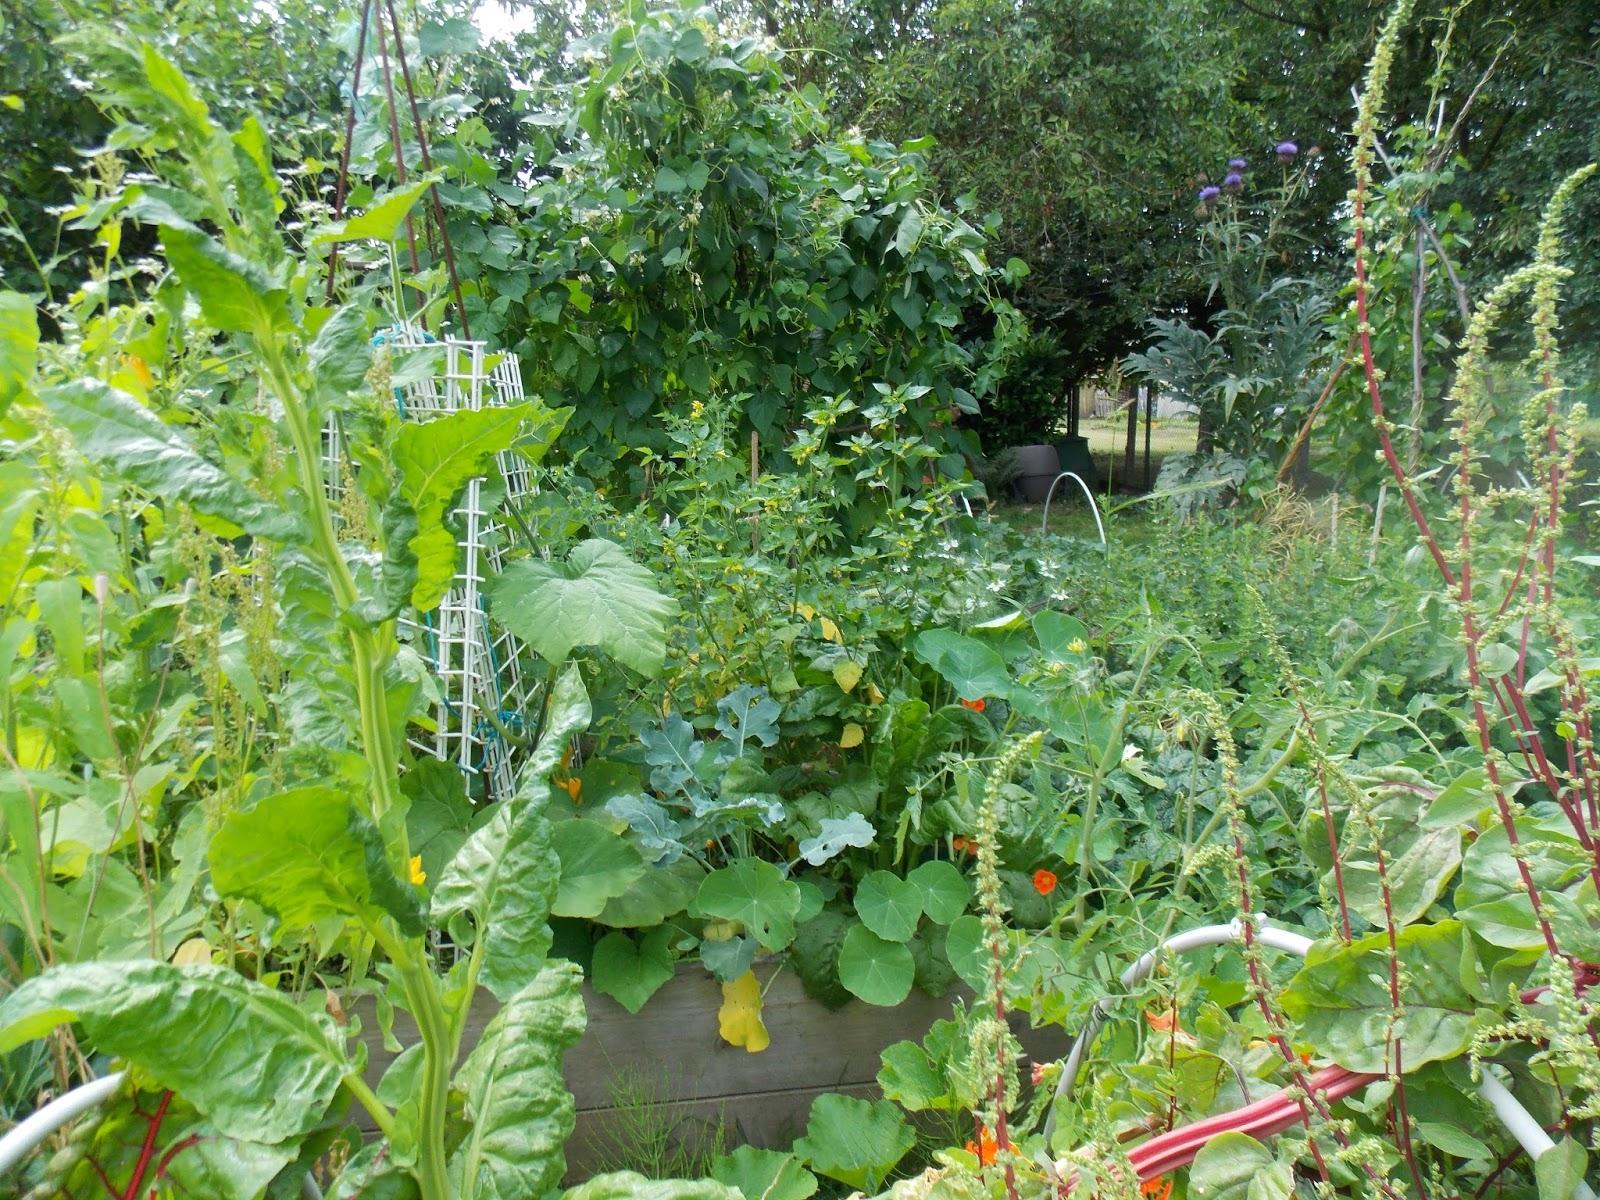 Ecolo bio nature permaculture urbaine et jardinage bio for Jardin et jardinage